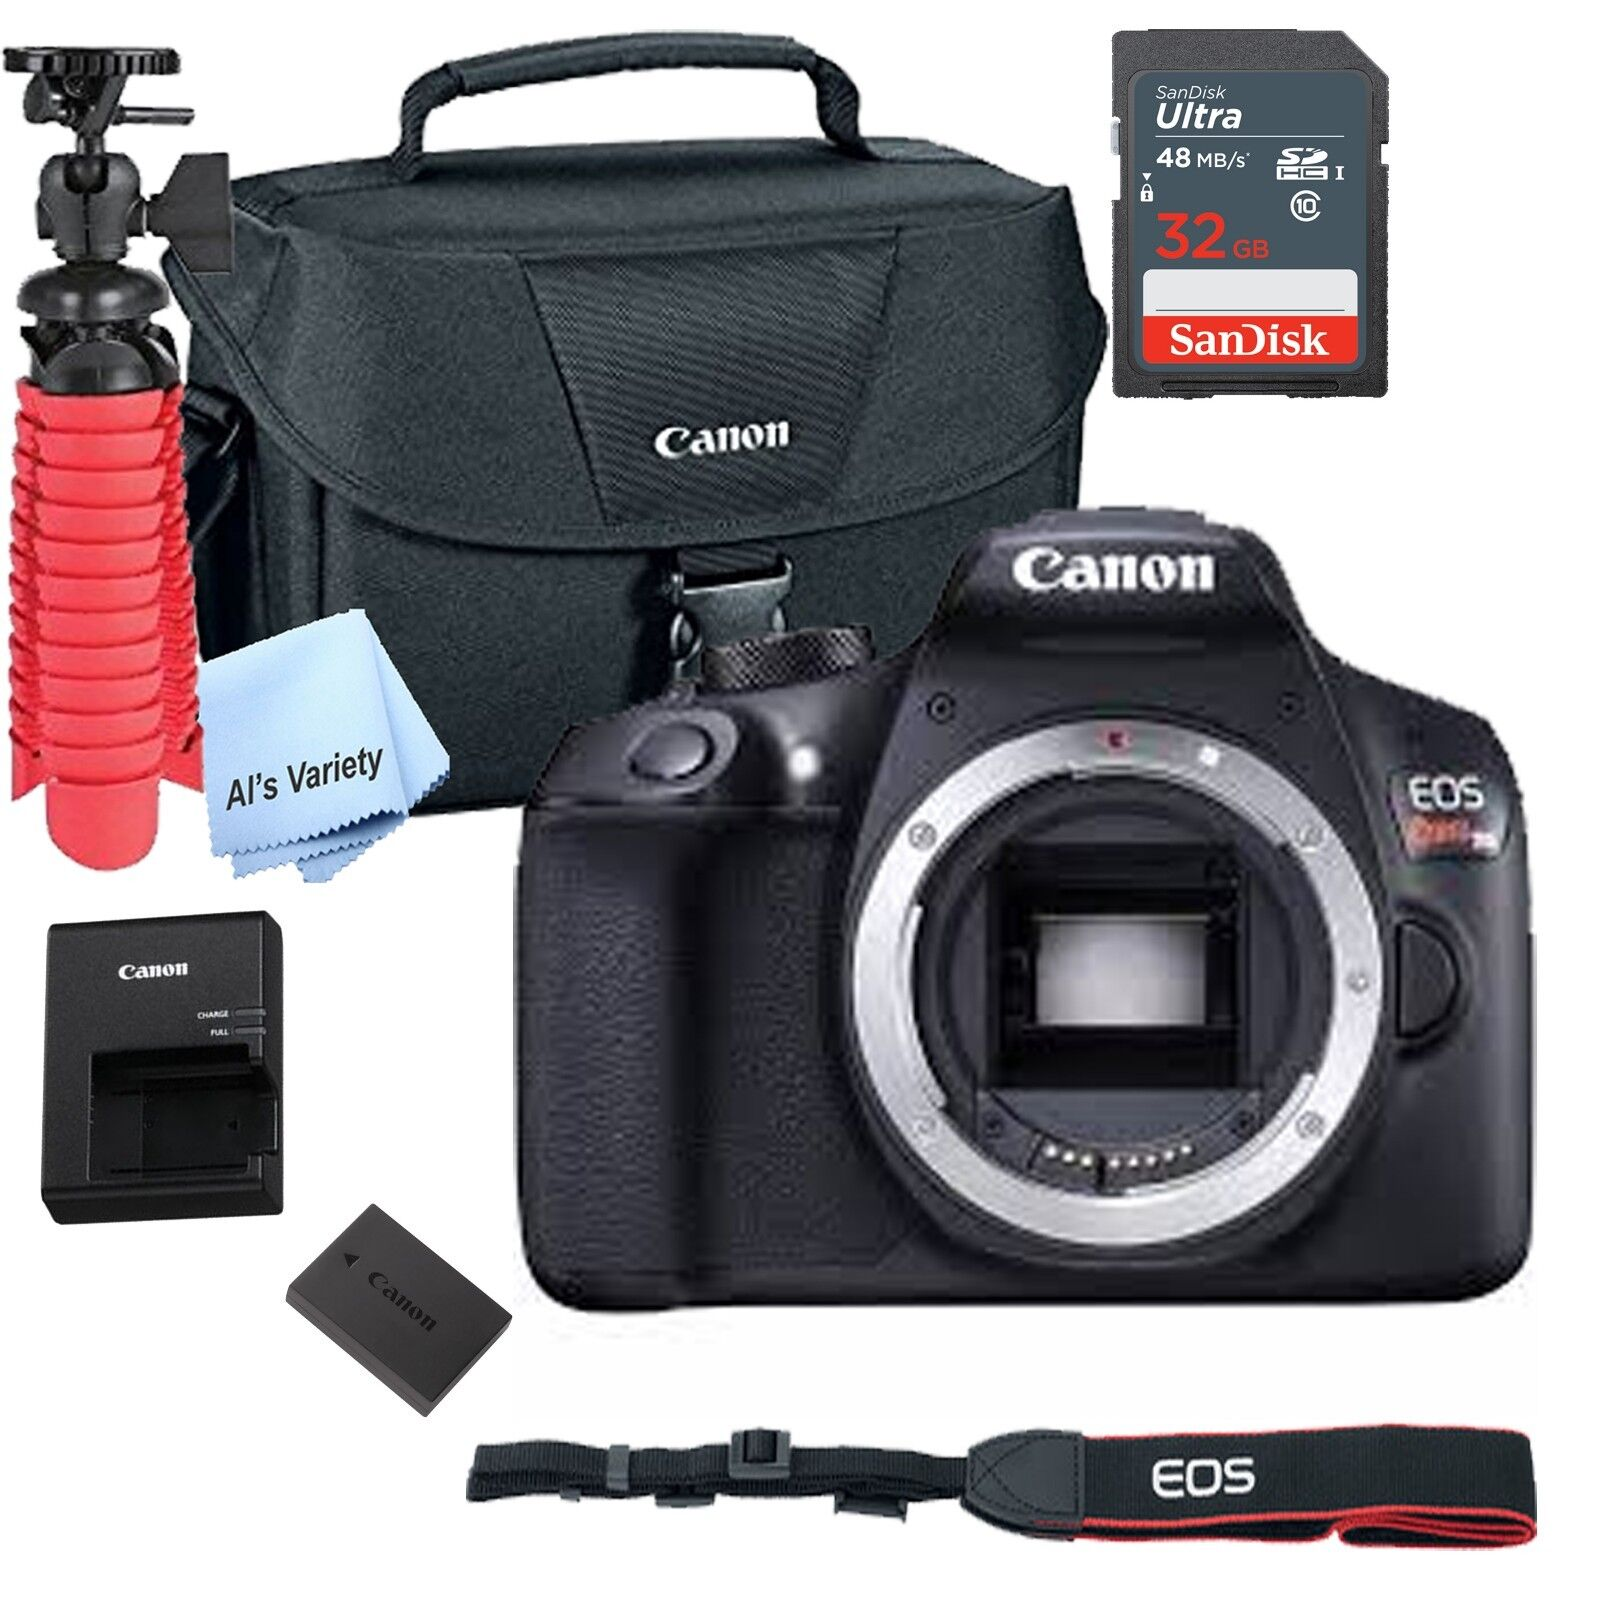 New Canon Rebel T6 SLR Camera Premium Kit  Bag, SD Card